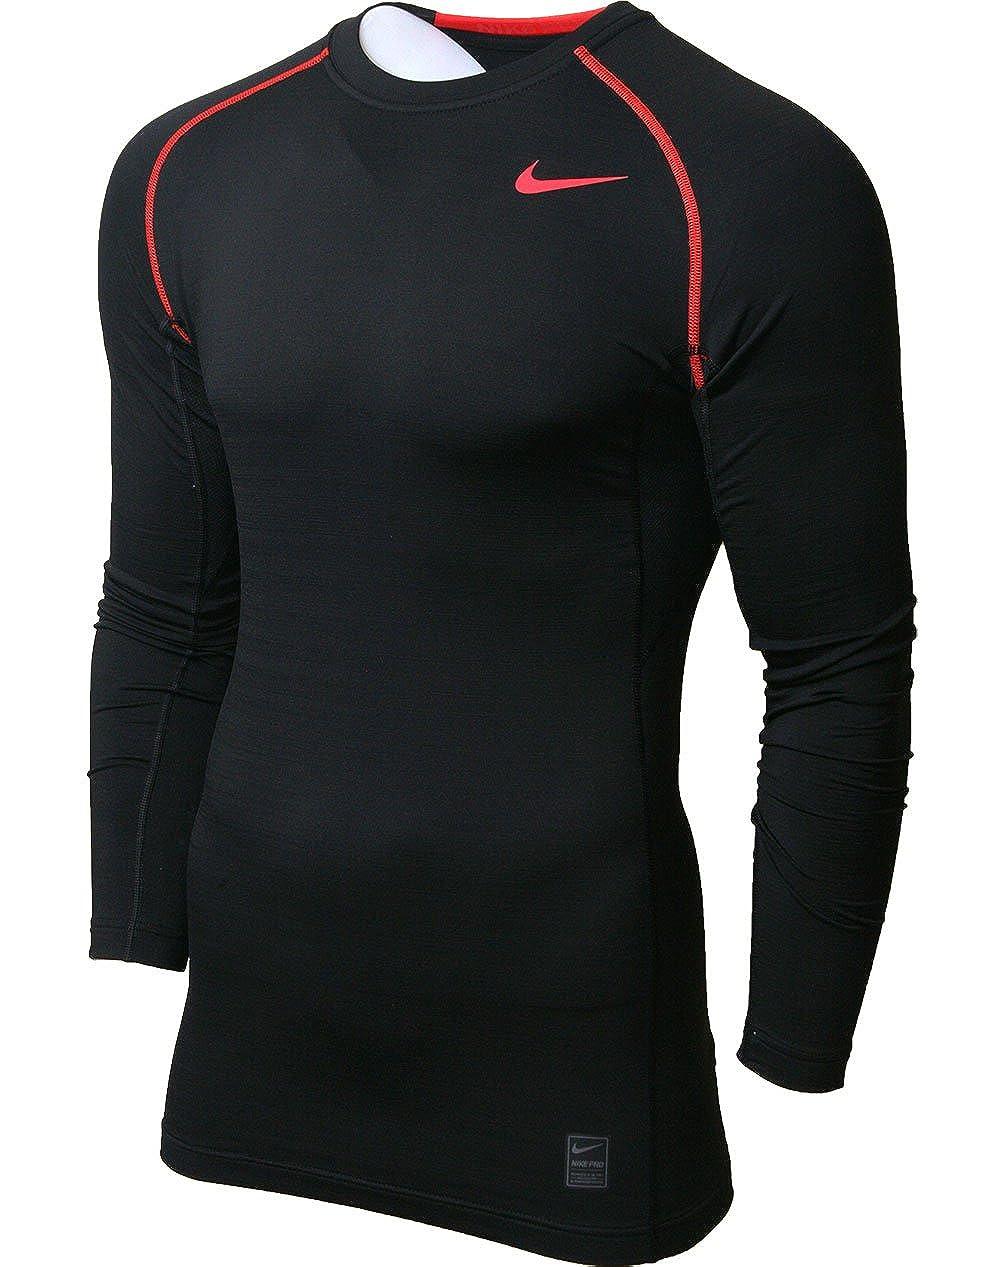 fc7f30bbe5c0 Nike Men s Pro Combat Hyperwarm Dri-FIT Max Fitted Men s Long-Sleeve Shirt